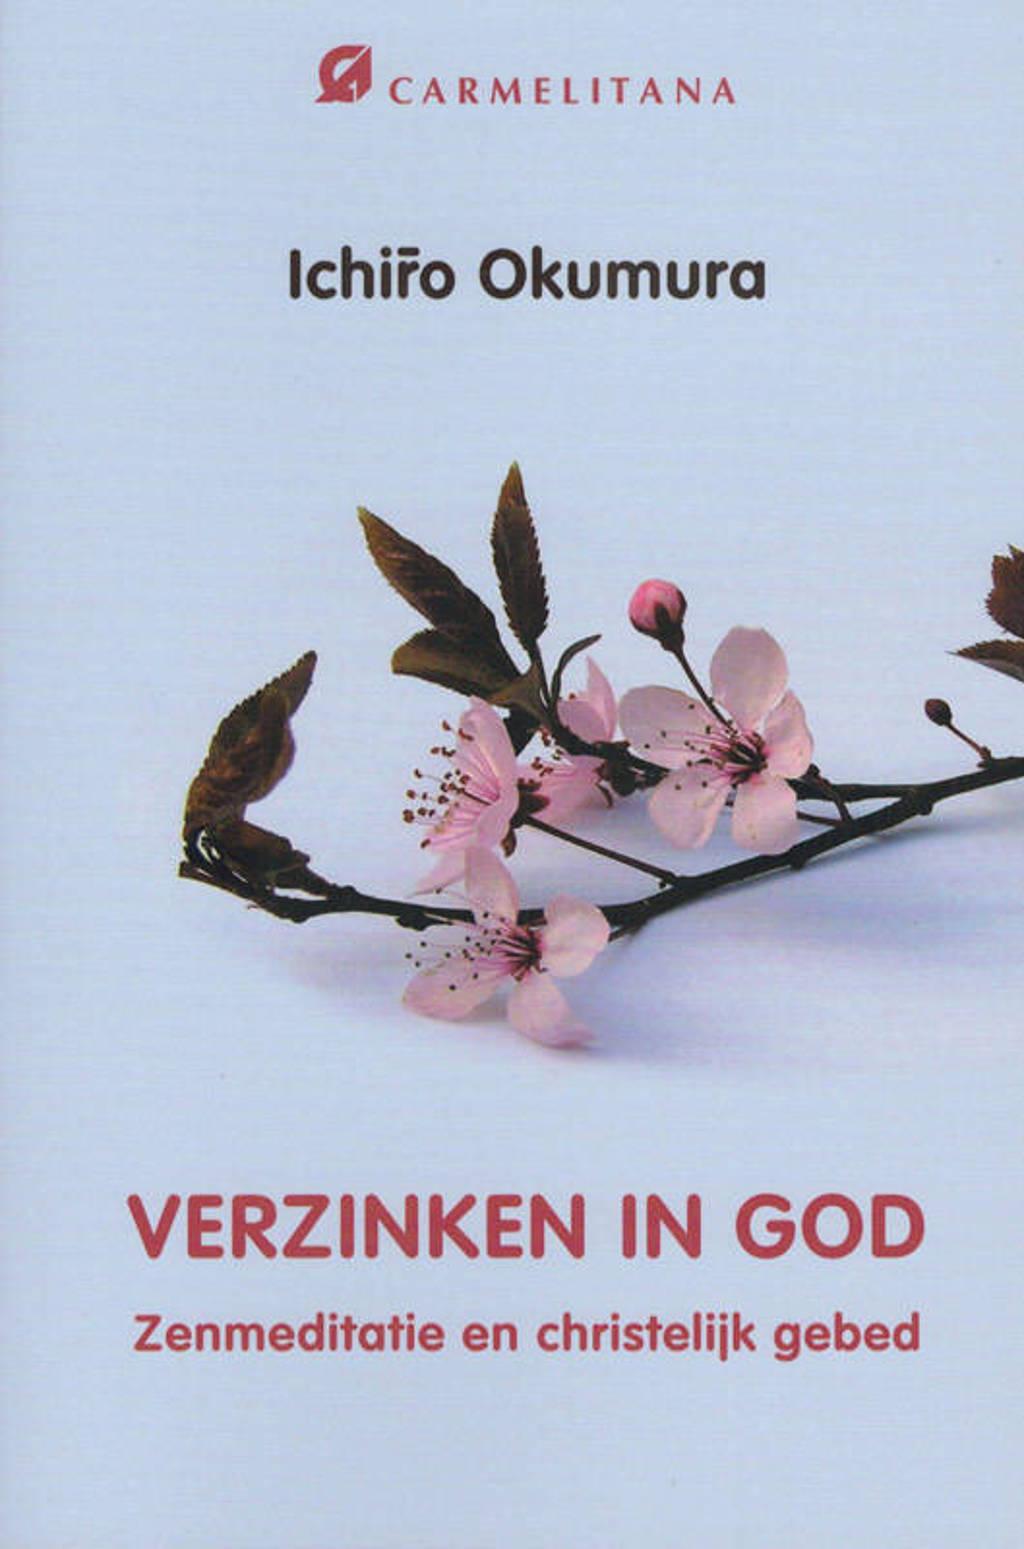 Verzinken in god - Ichiro Okumura